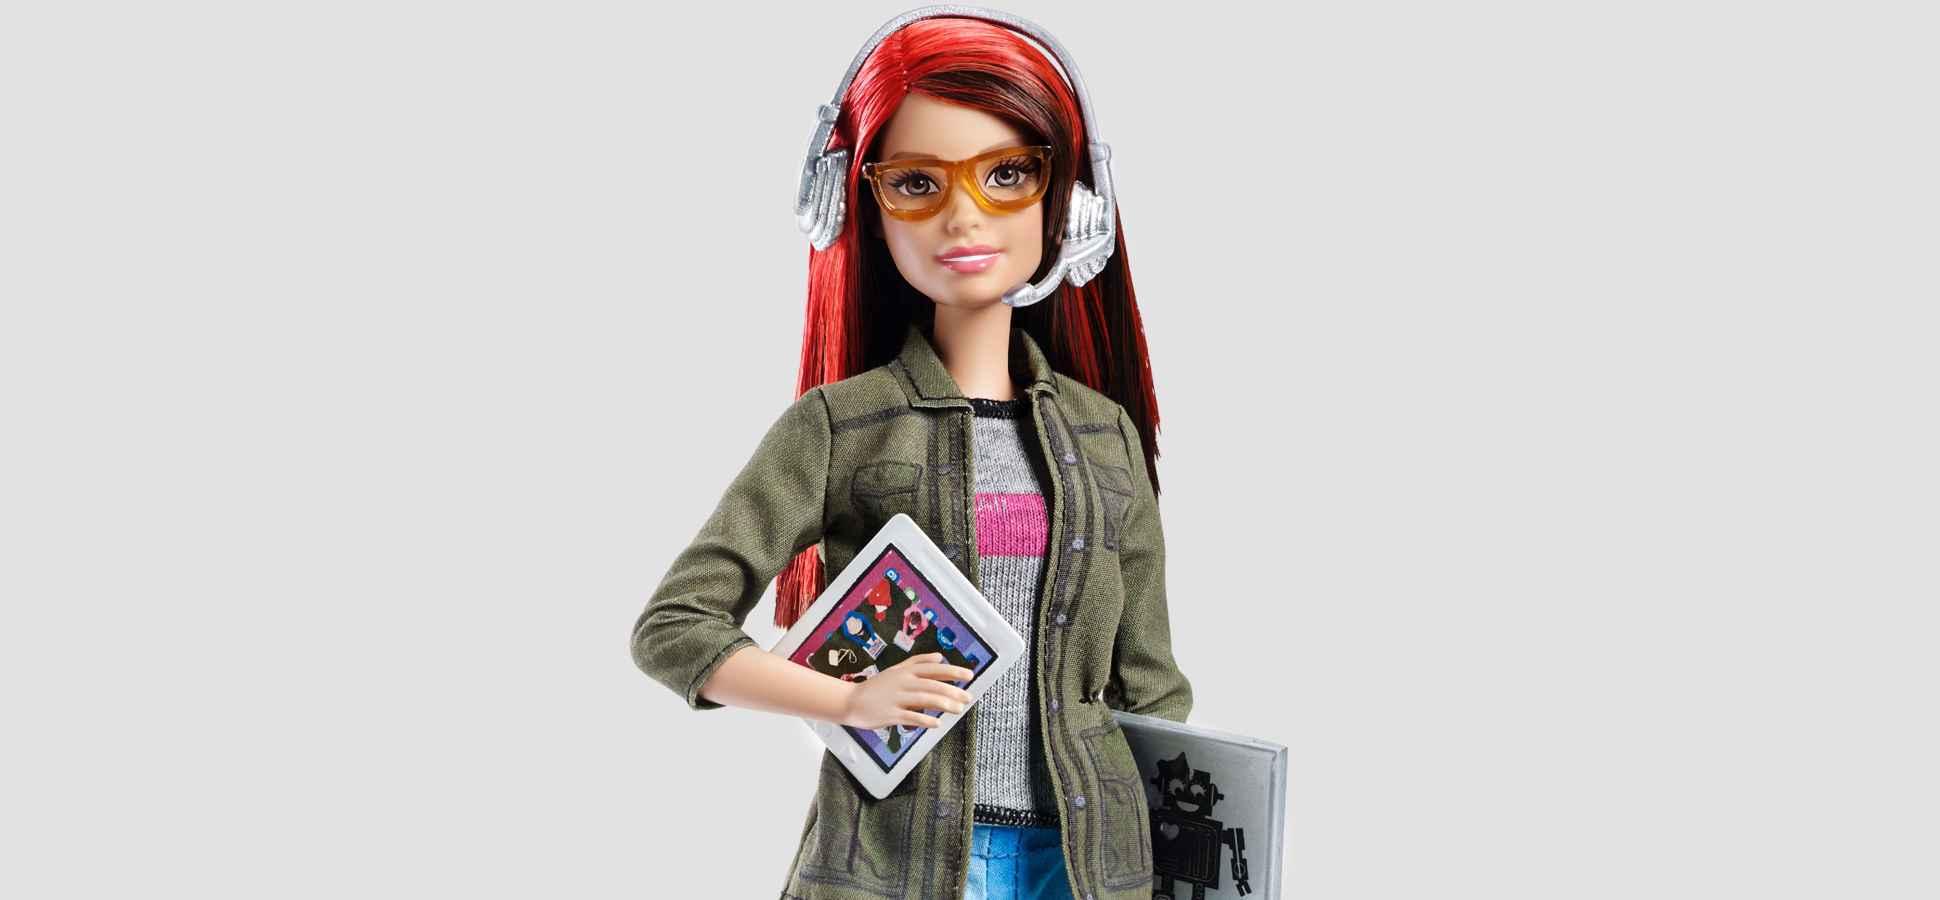 Why Mattel's New Developer Barbie Is a Big Hit Among Women in Tech